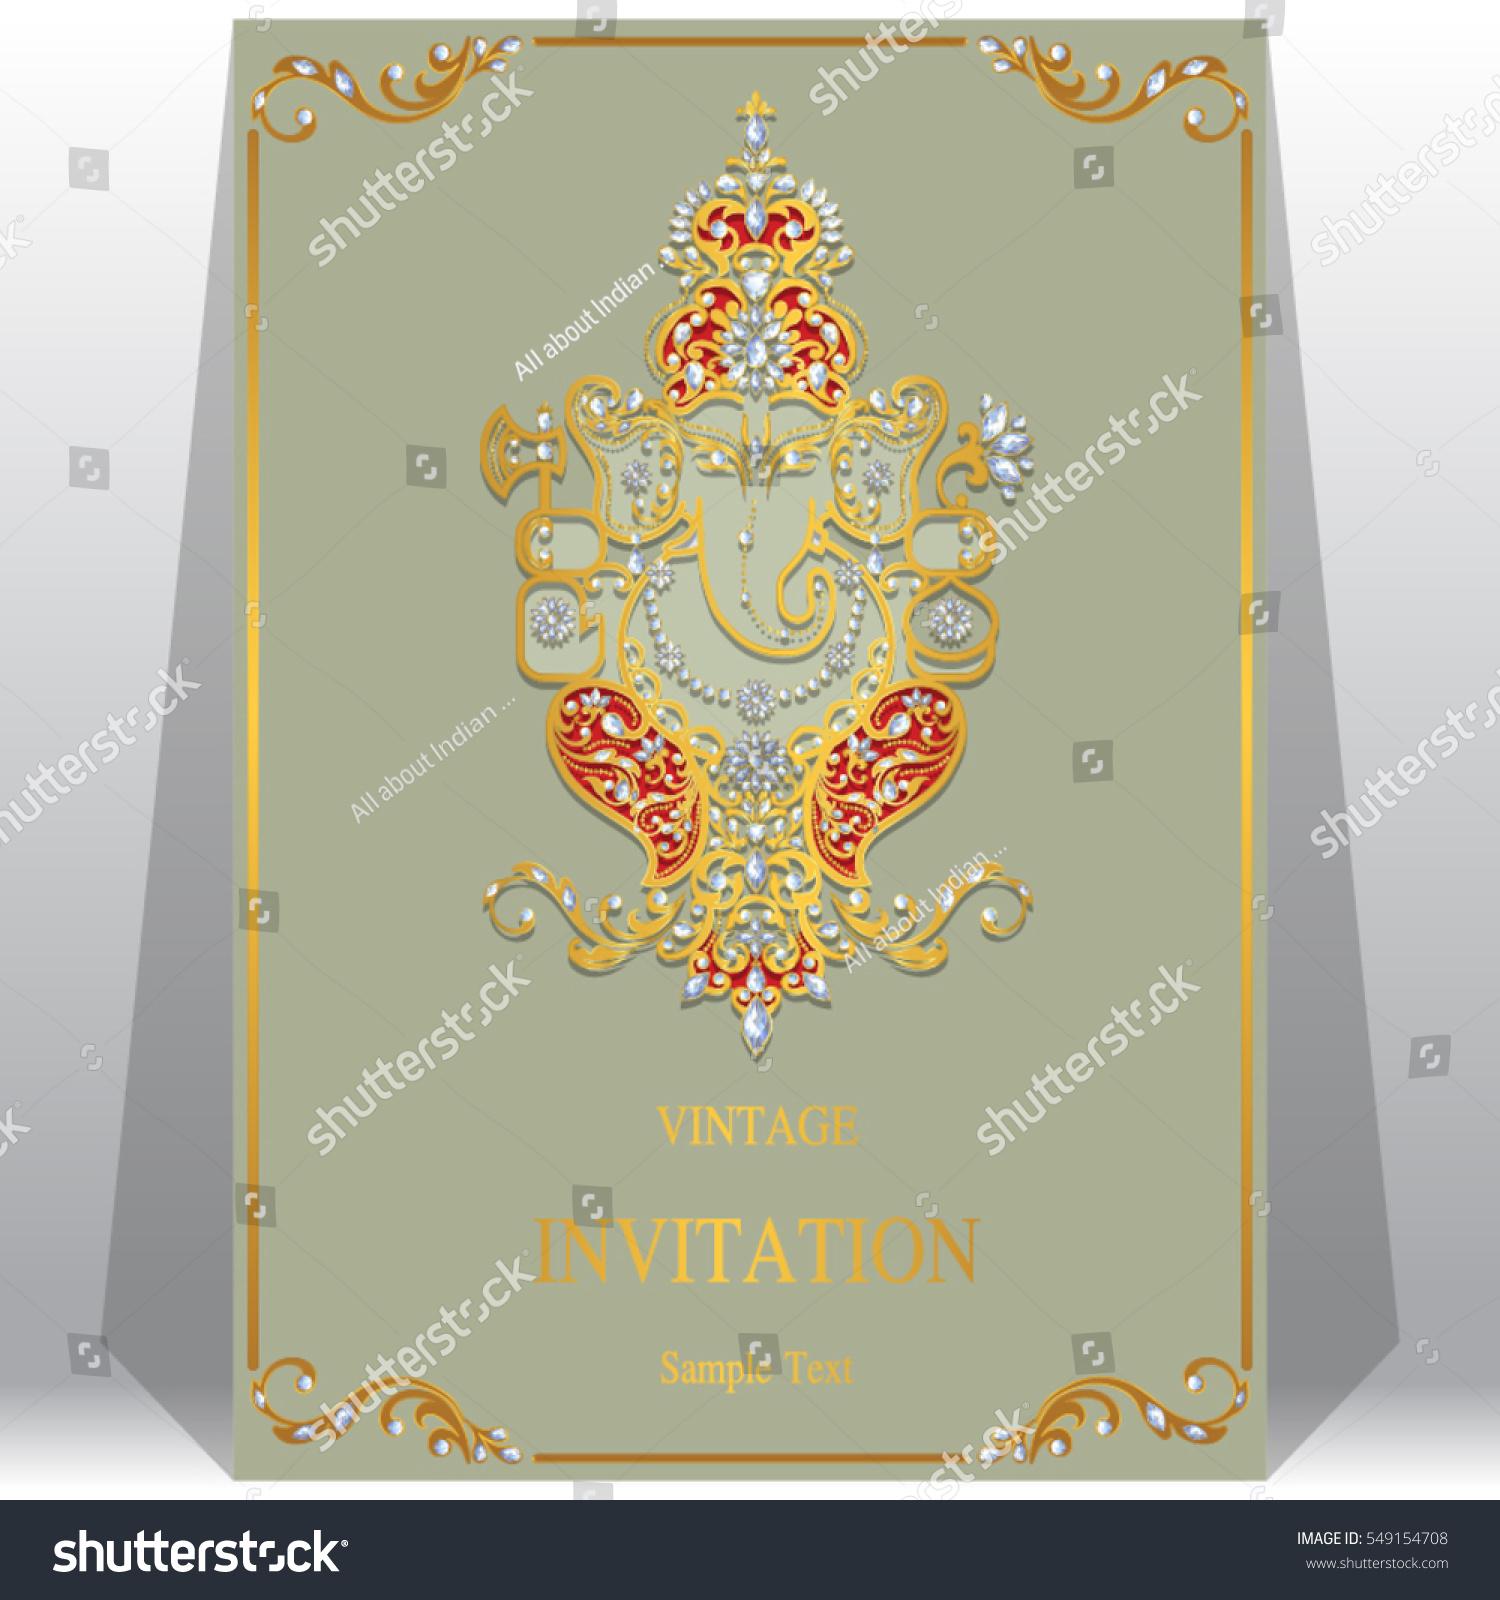 indian wedding invitation card templates gold stock vector 549154708 shutterstock. Black Bedroom Furniture Sets. Home Design Ideas